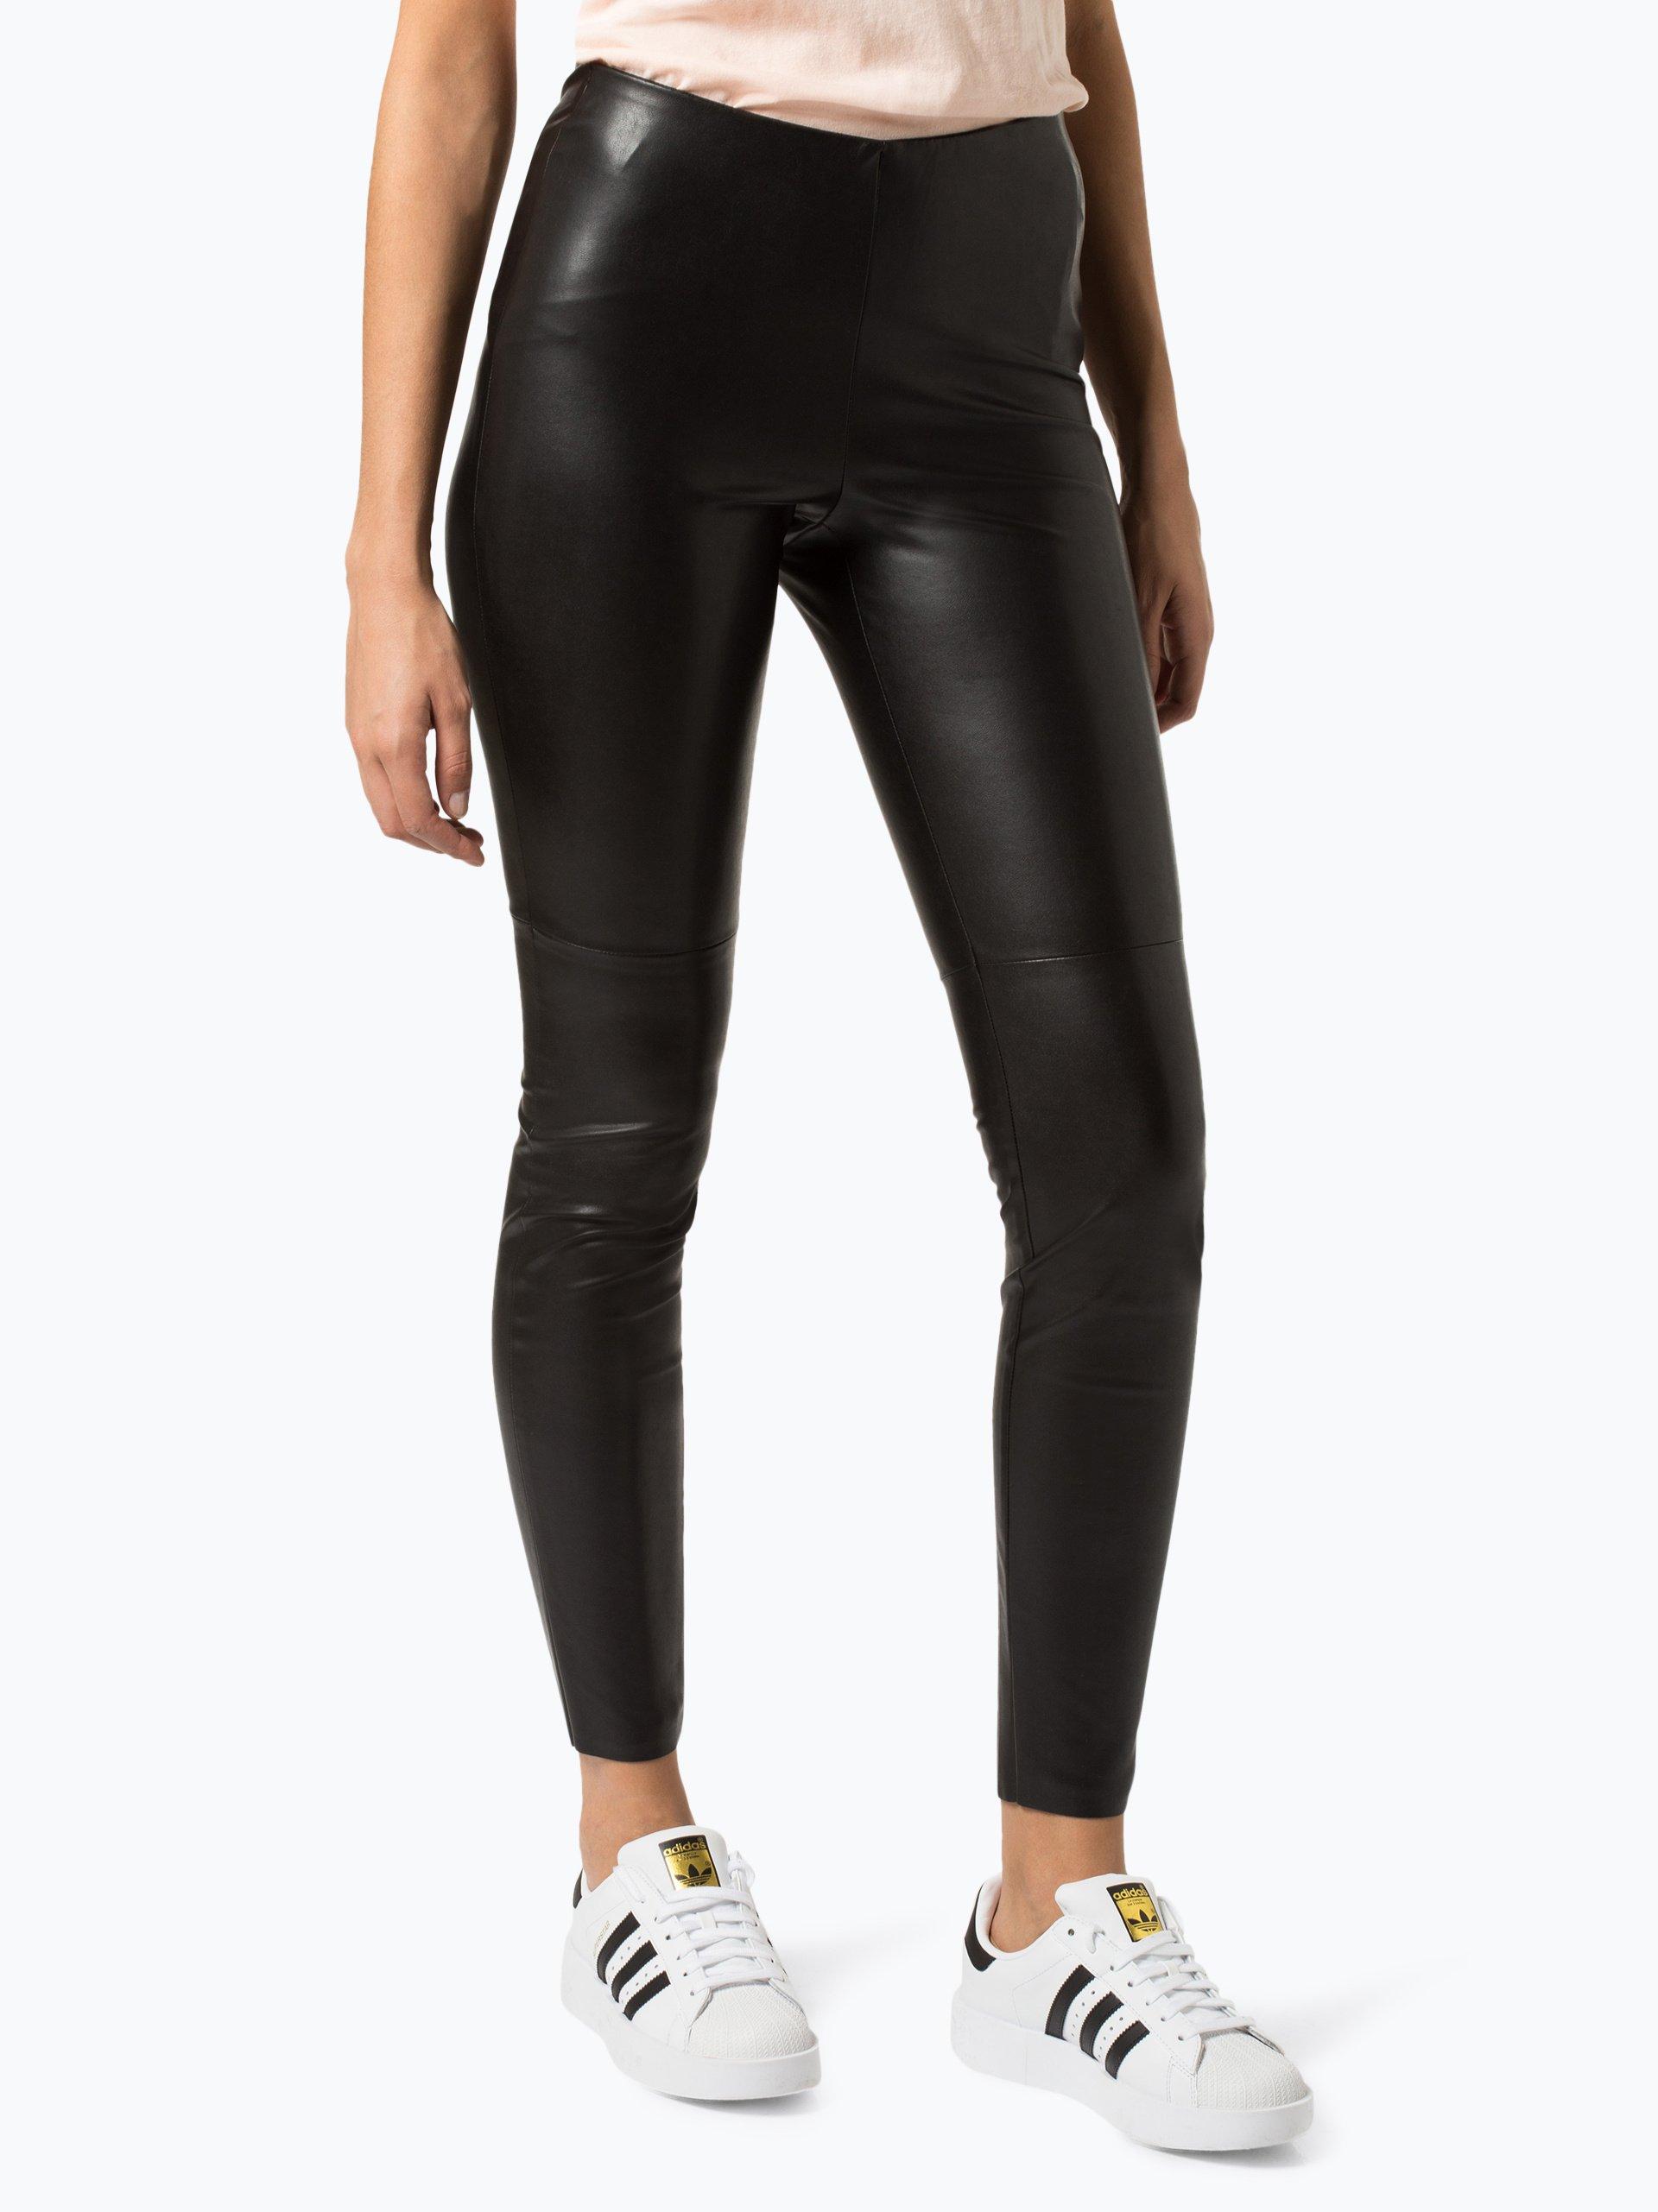 Cambio Damen Hose in Leder-Optik - Randa